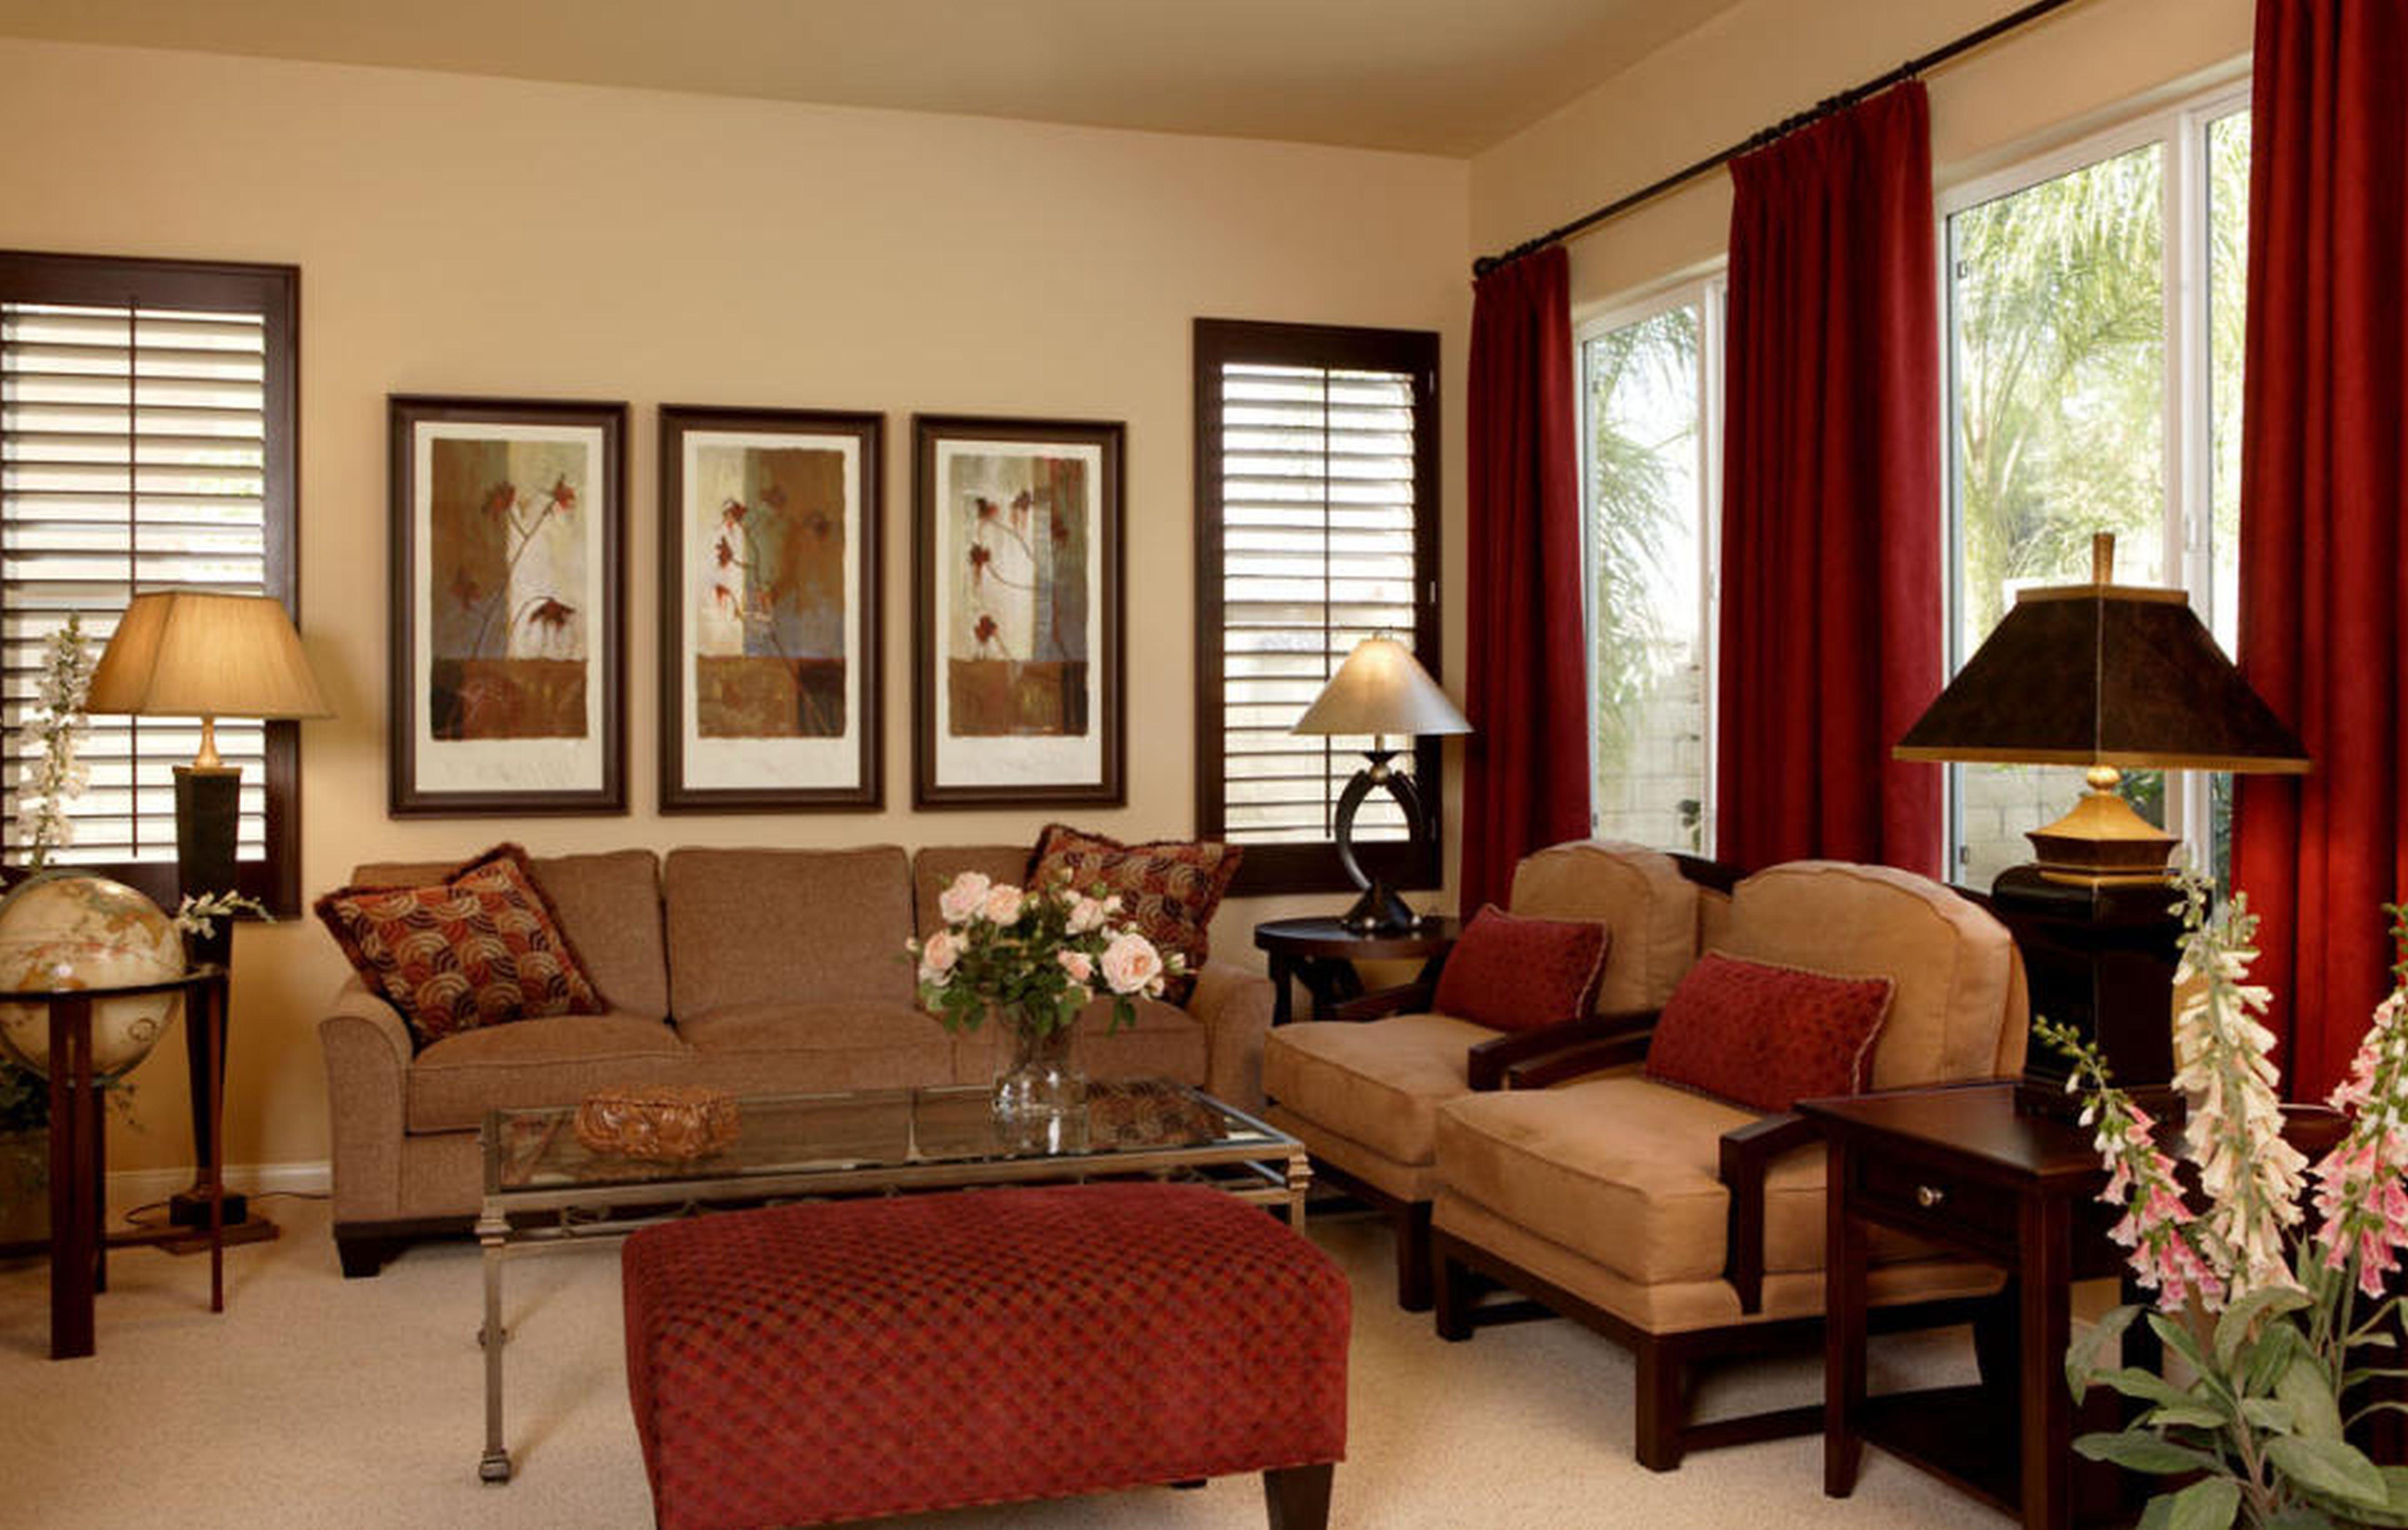 Mobile home interior ideas modern minimalist apartment living room design ideas  in